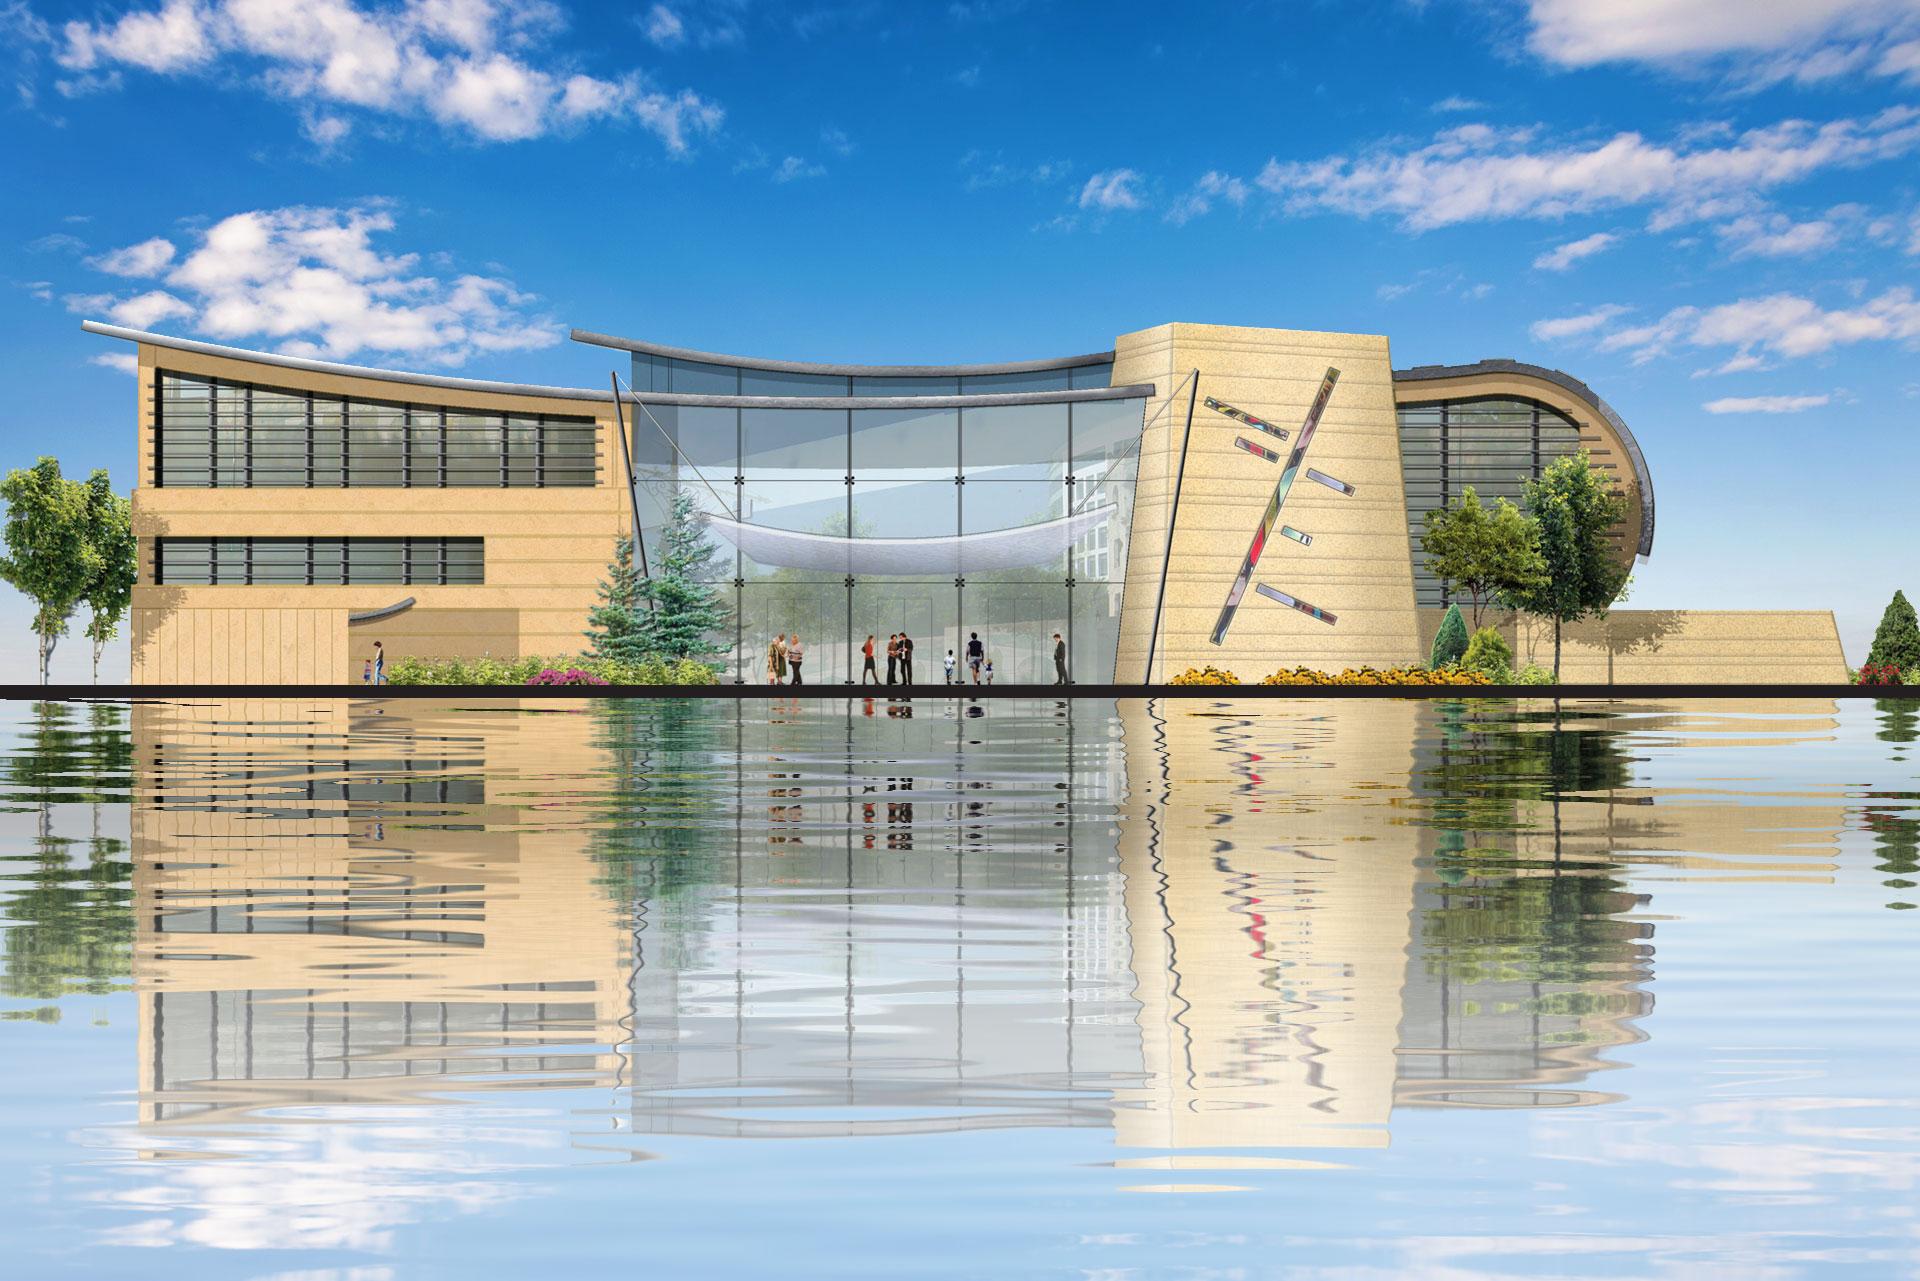 Architecture by Saab International